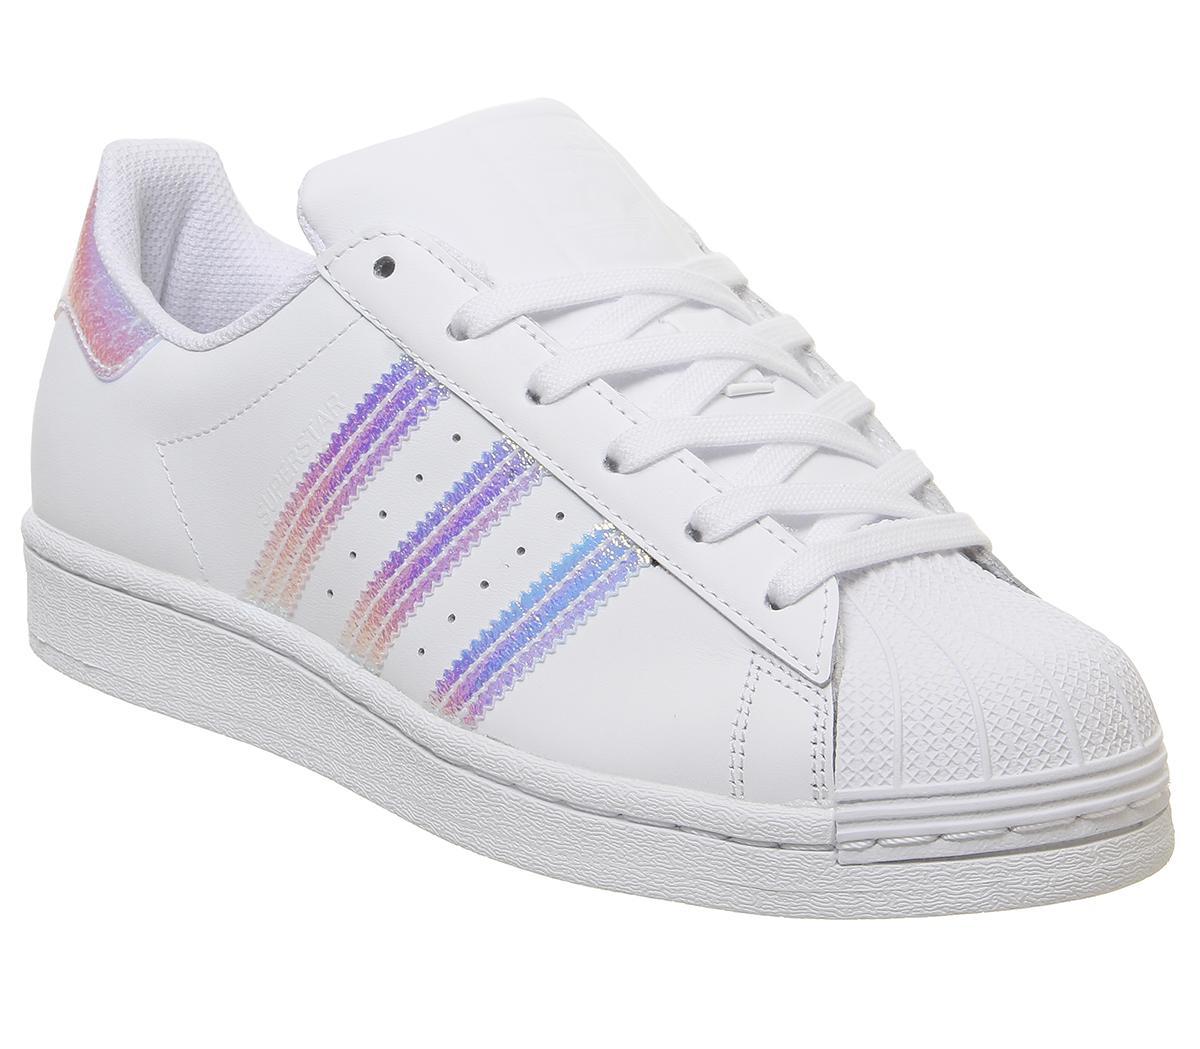 adidas Superstar Gs White Metallic